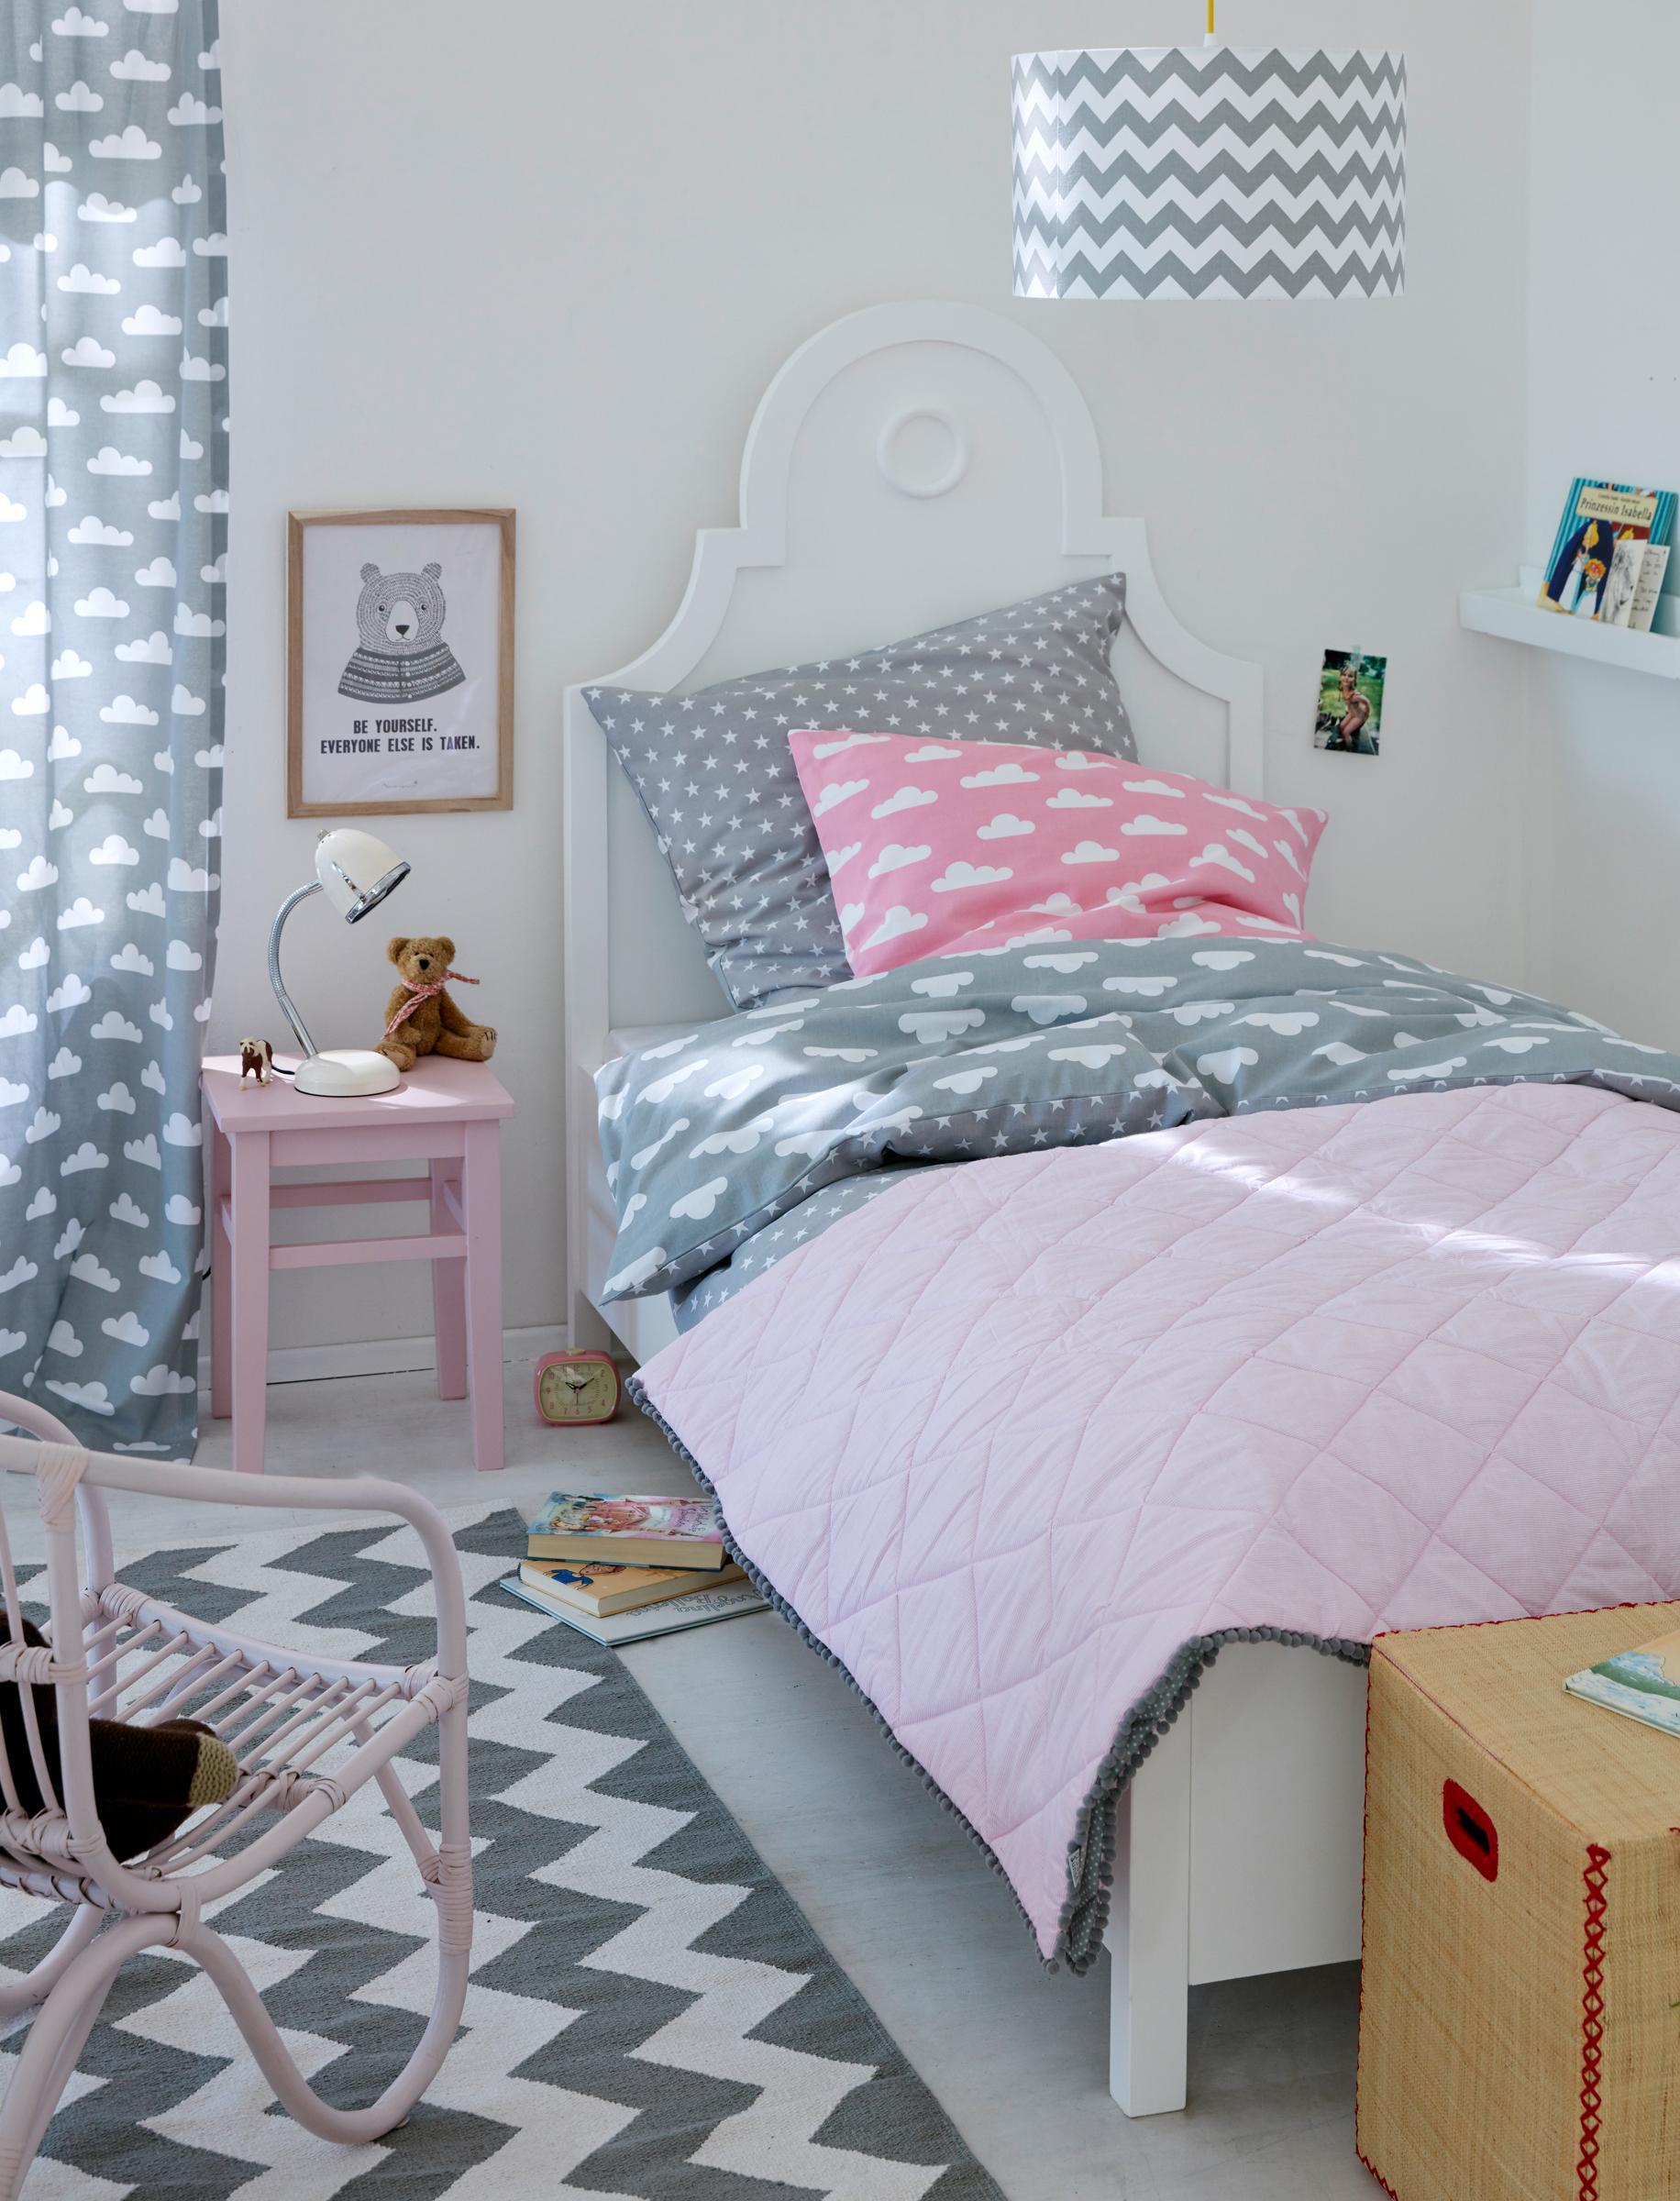 Kinderzimmer in Grau-Rosa #kinderbett #mädchenzimmer...